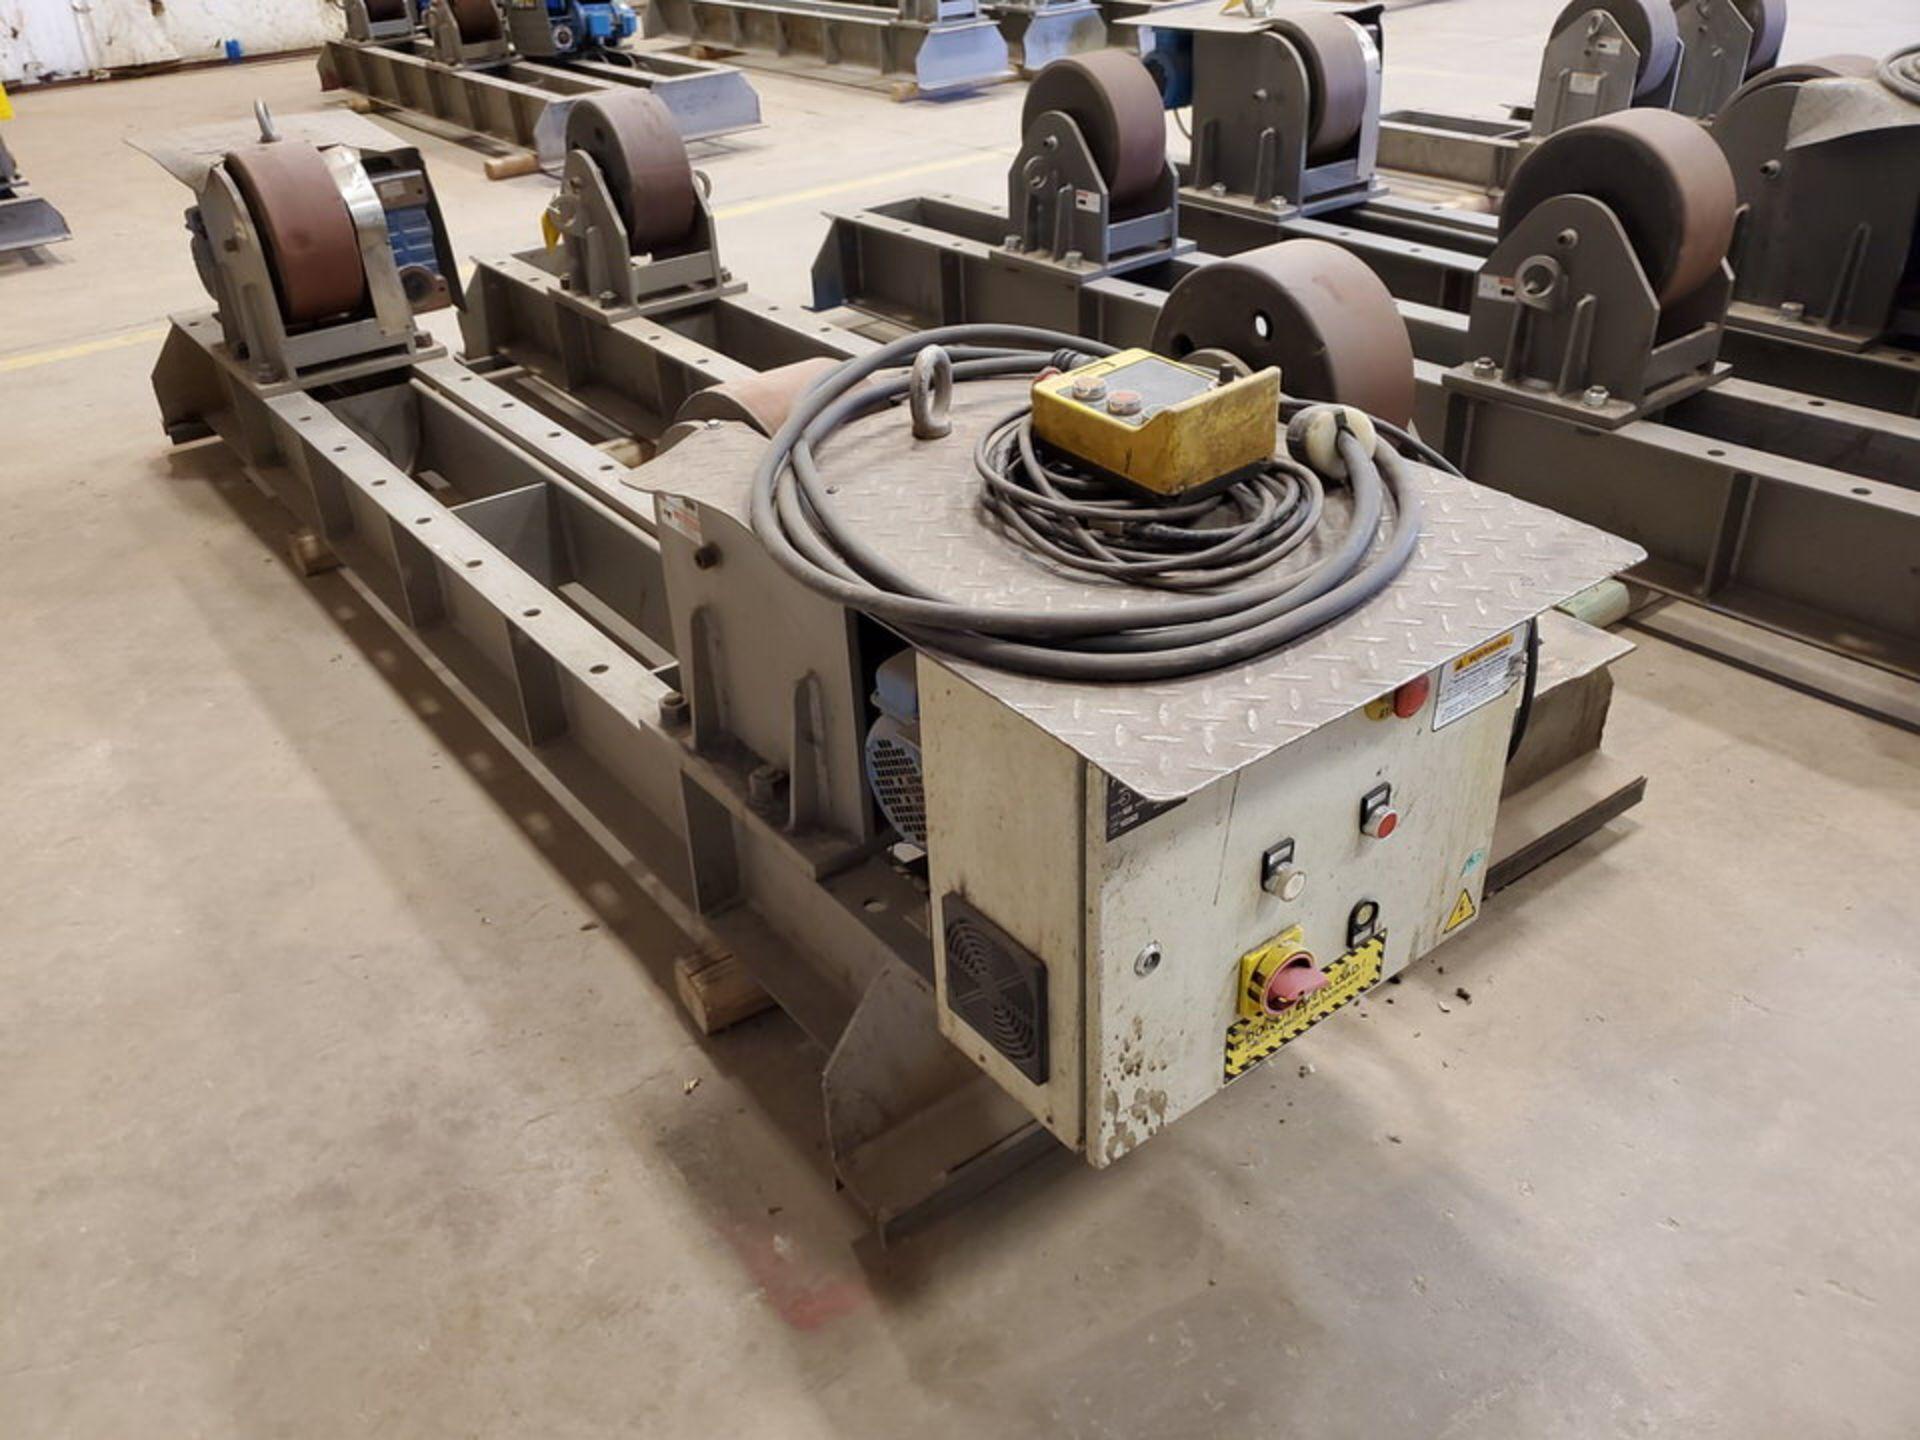 "Profax TR-40000 Turn Roll 20H Cap., 440V, 15A, 50/60HZ, 3PH, RPM: 0-1.7, 6"" Wheel Dia. - Image 6 of 8"